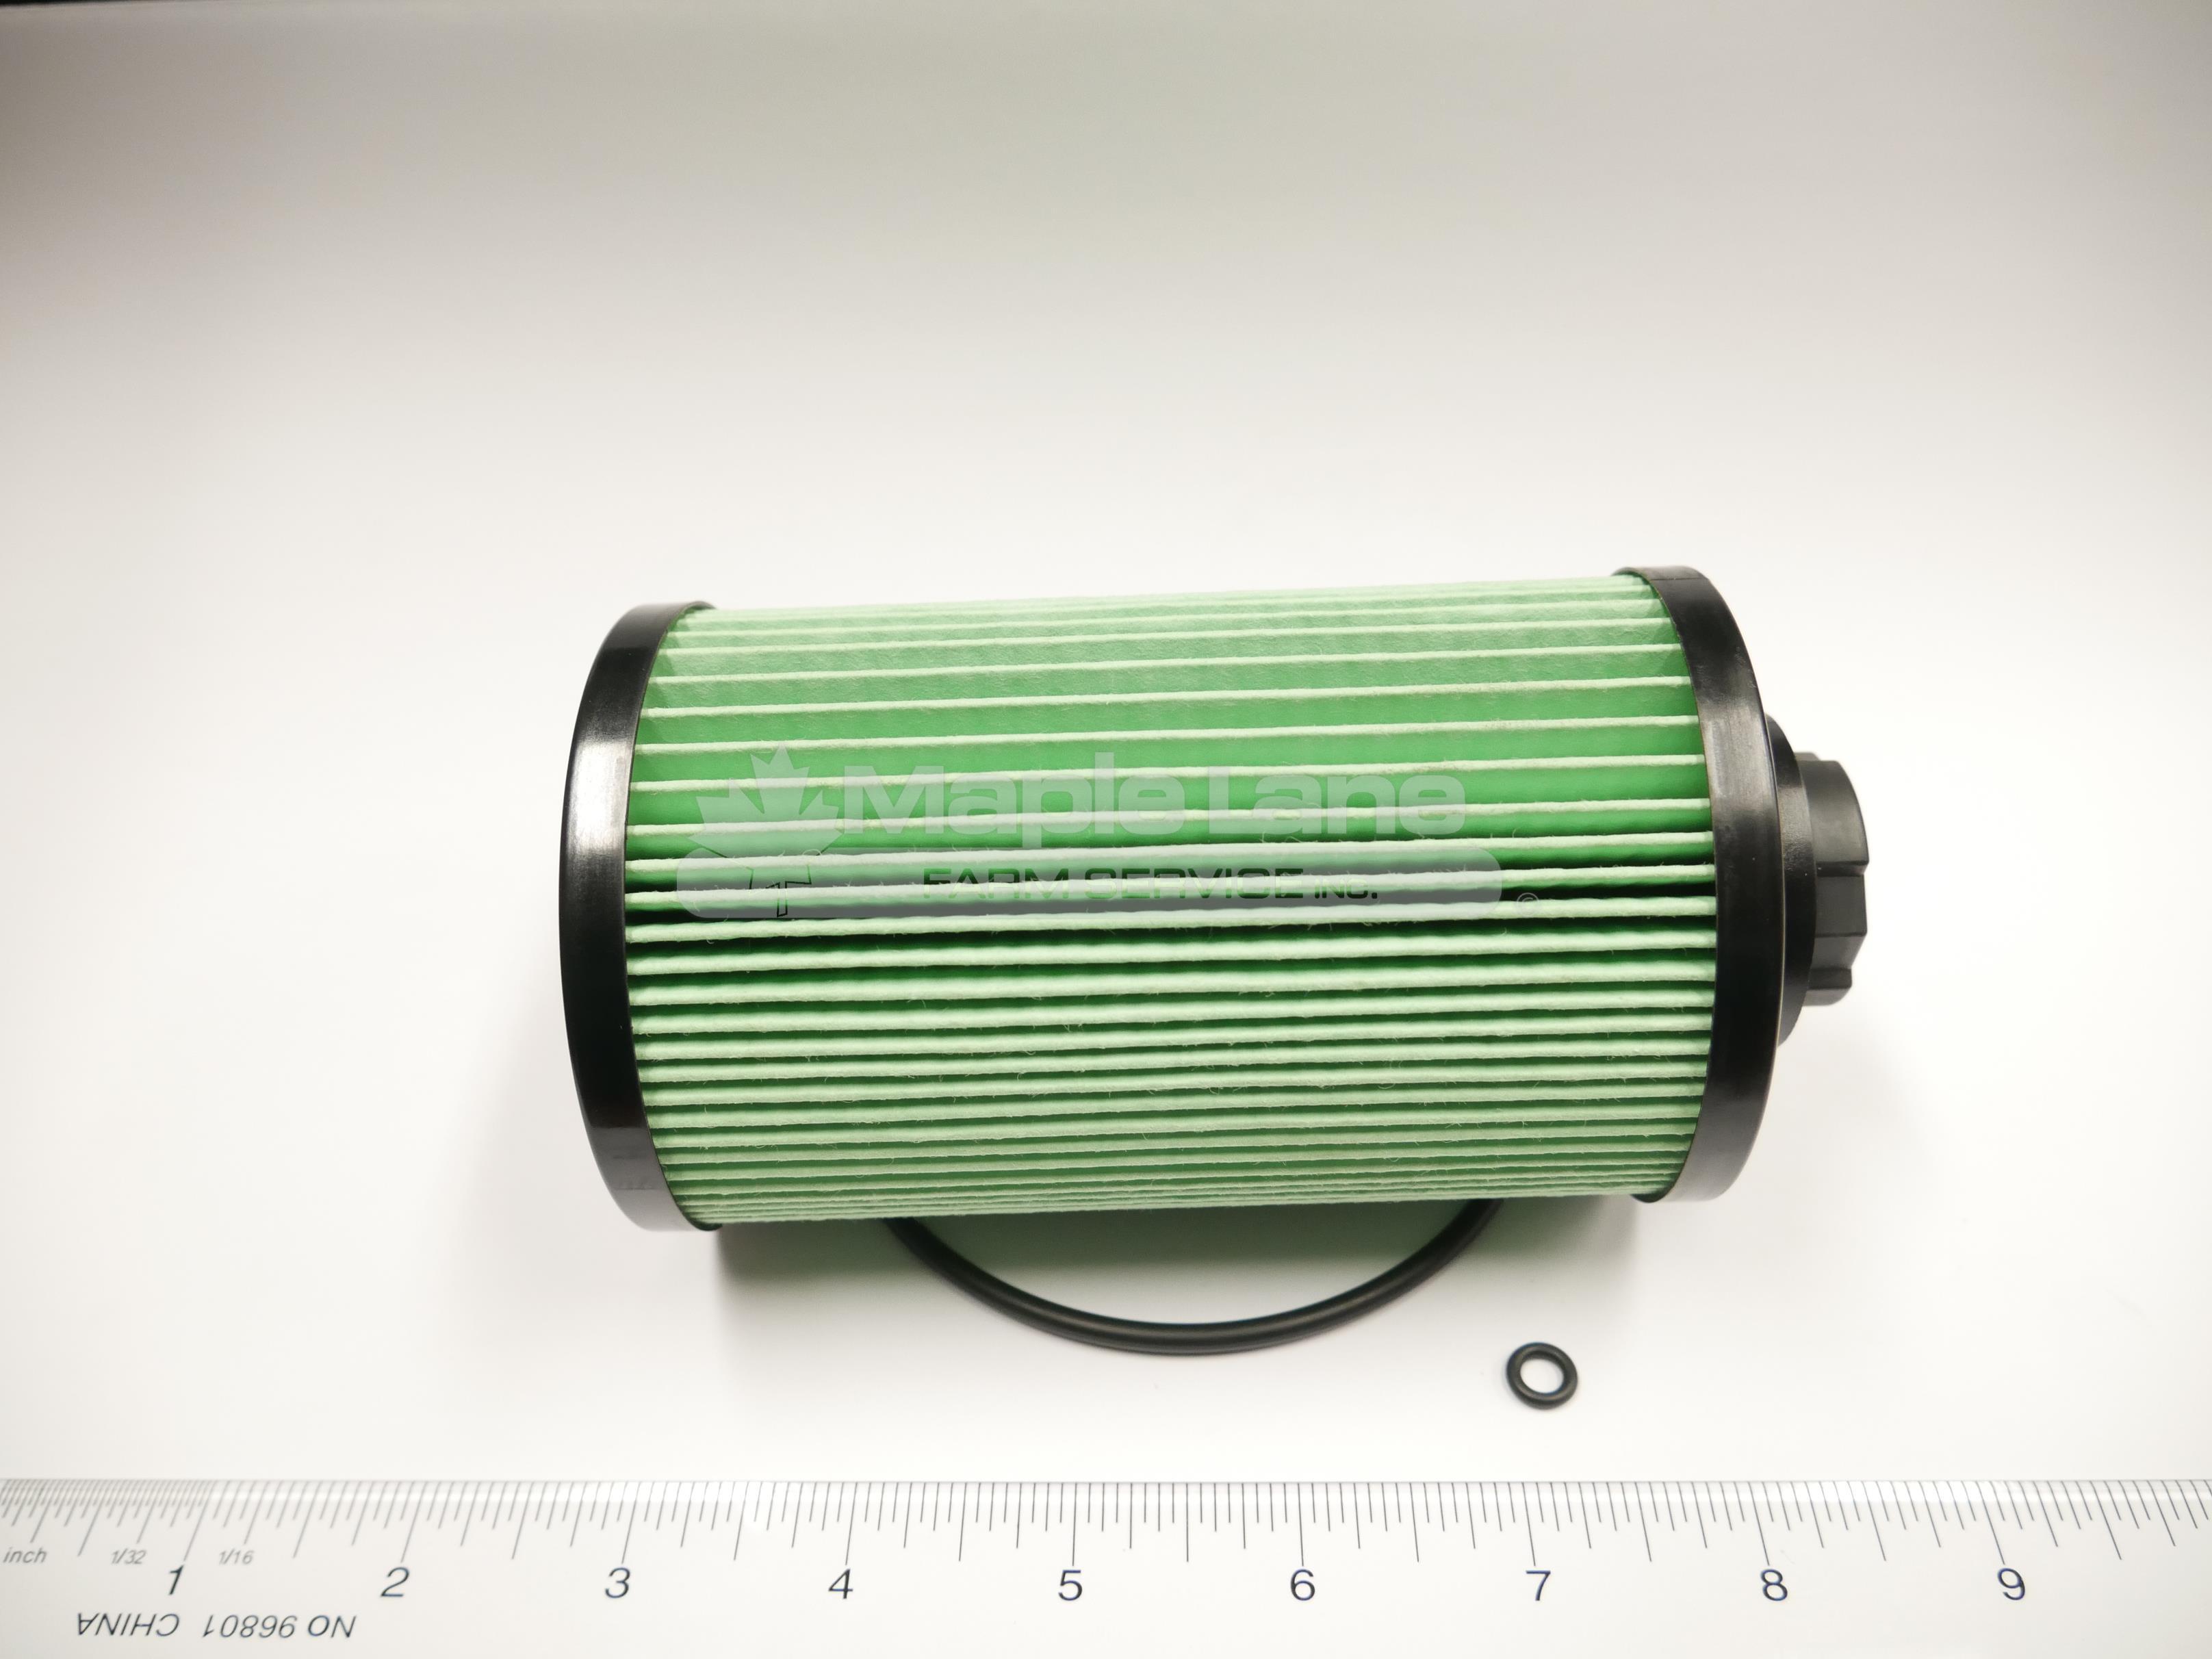 7064120m91 fuel filter kit